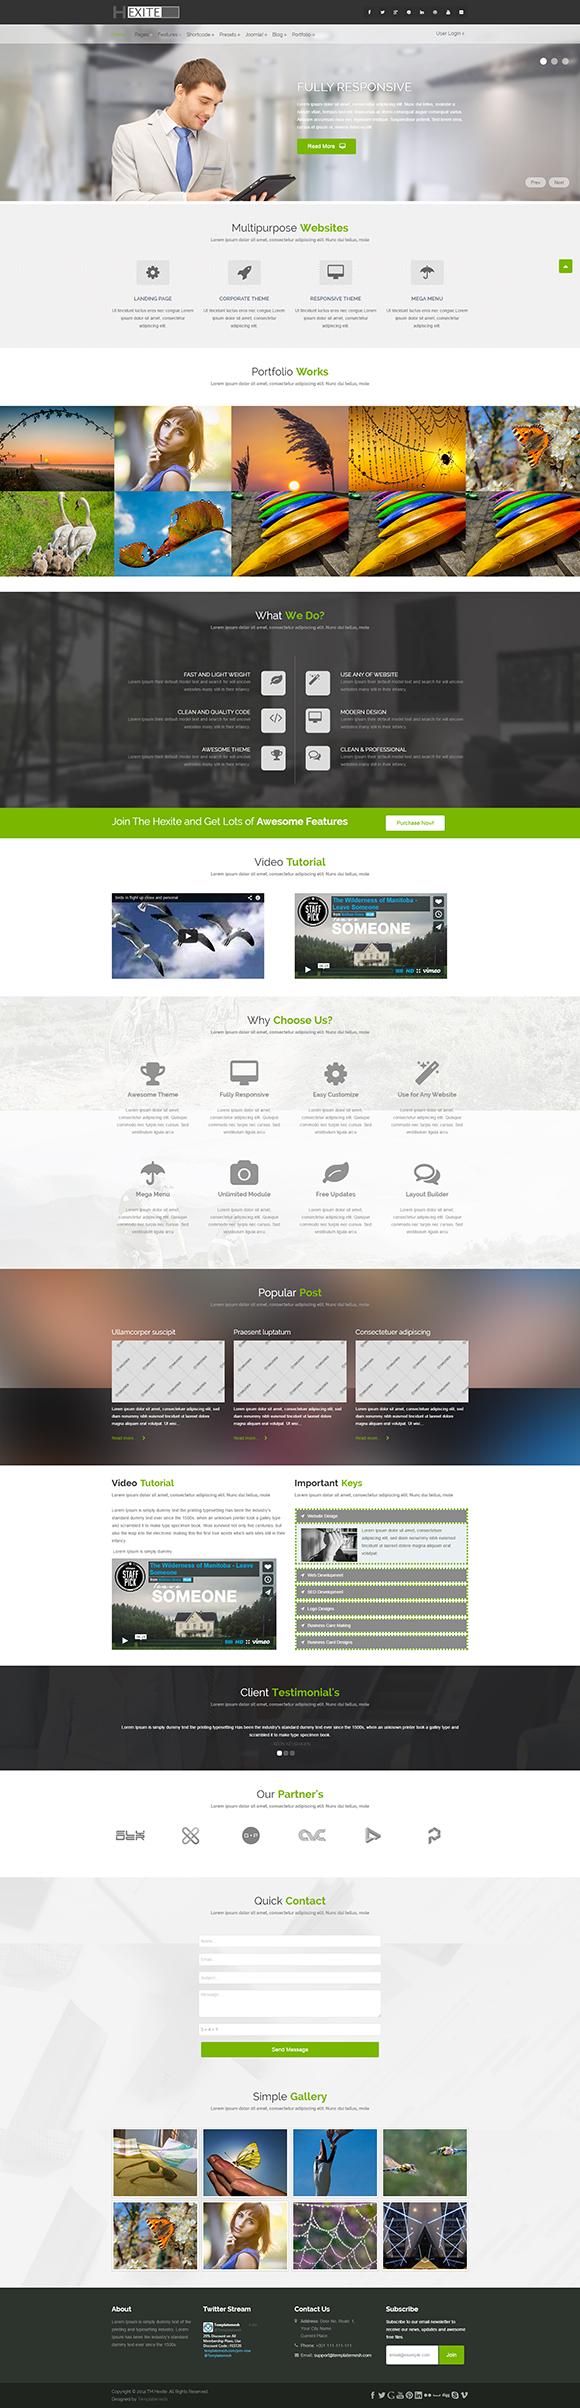 Hexite Bootstrap Joomla Template by TemplateMesh on Creative Market ...